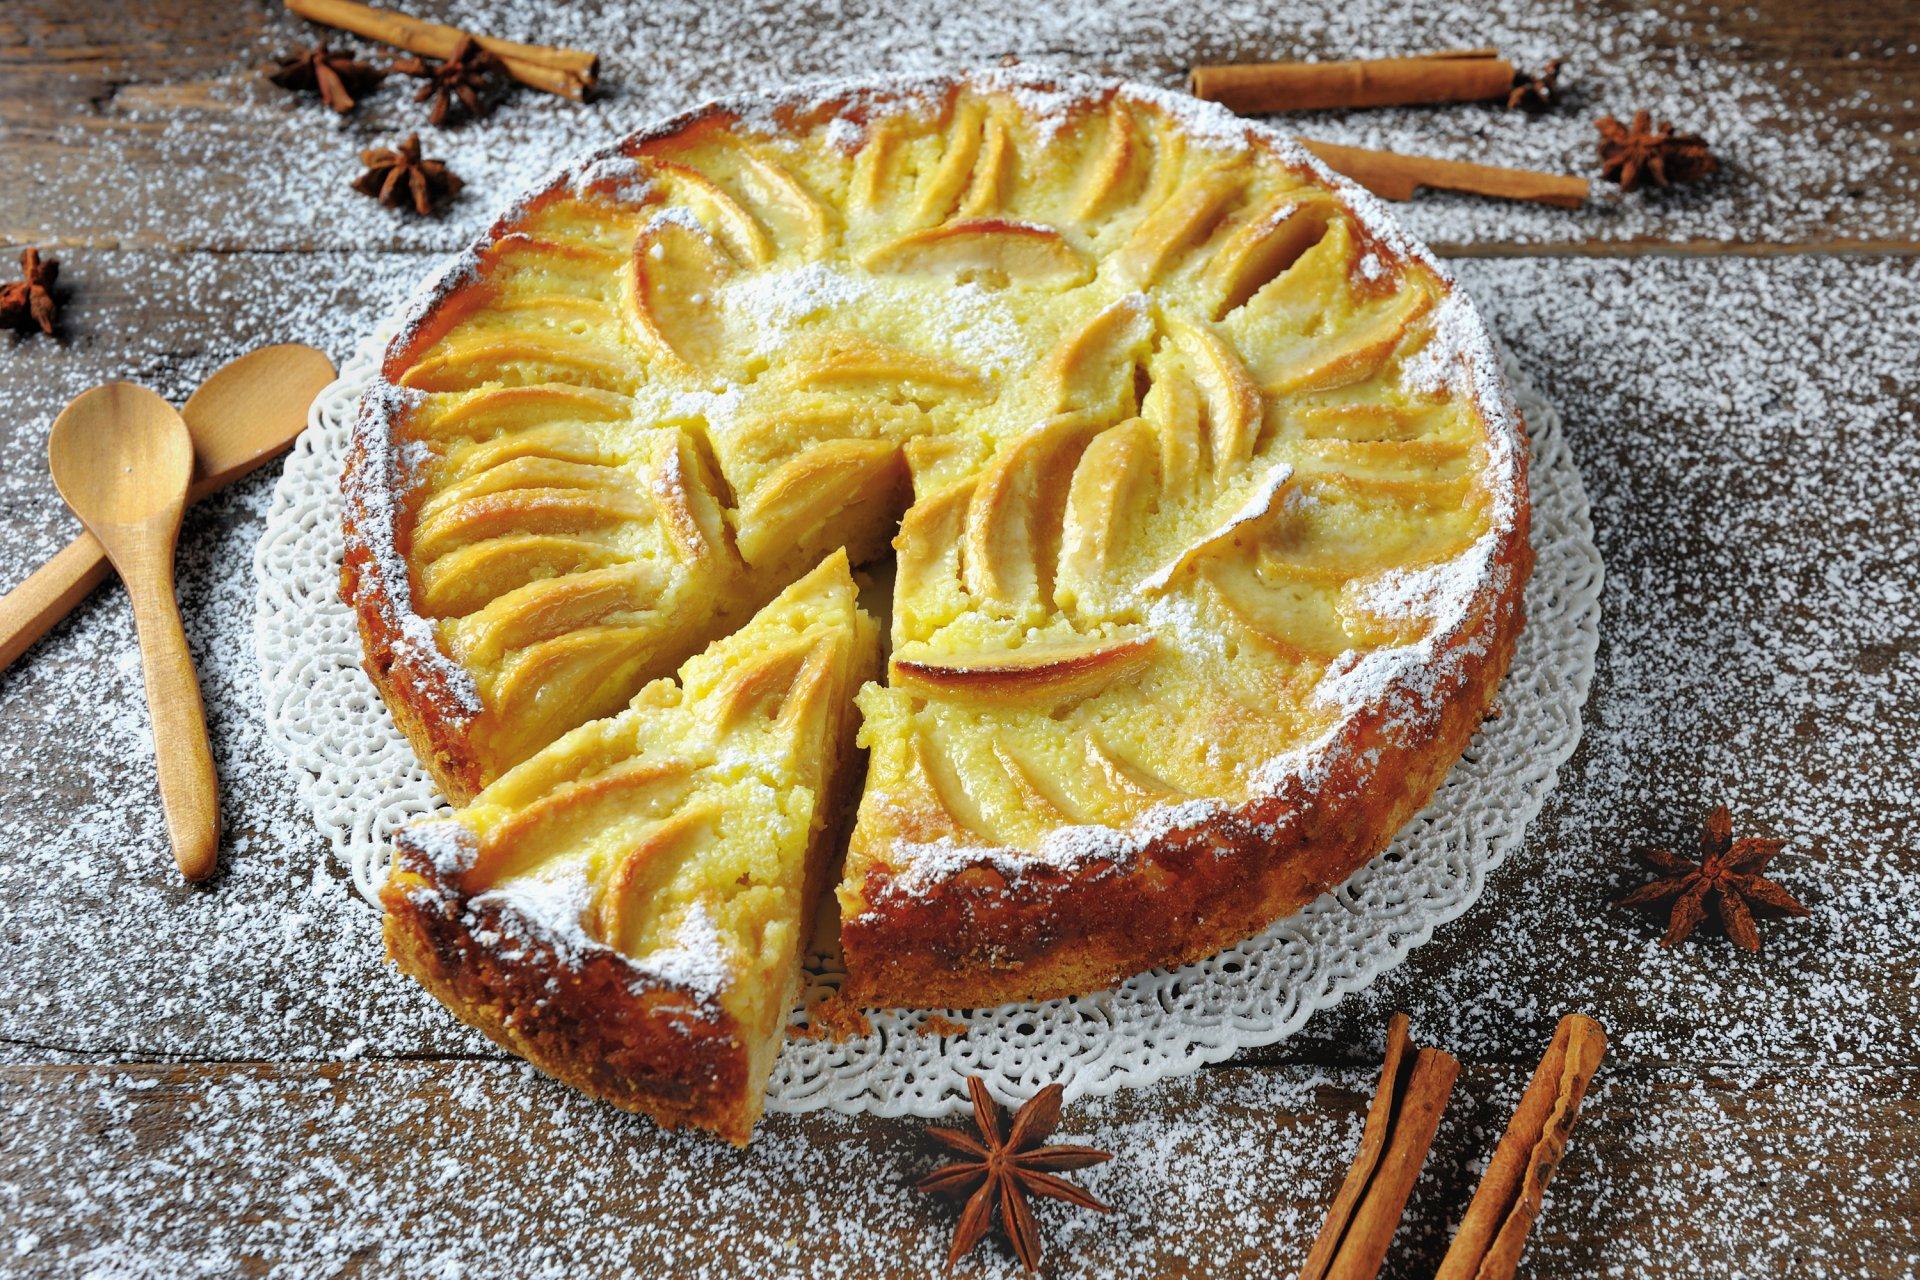 Food - Pie  Pastry Cinnamon Star Anise Wallpaper